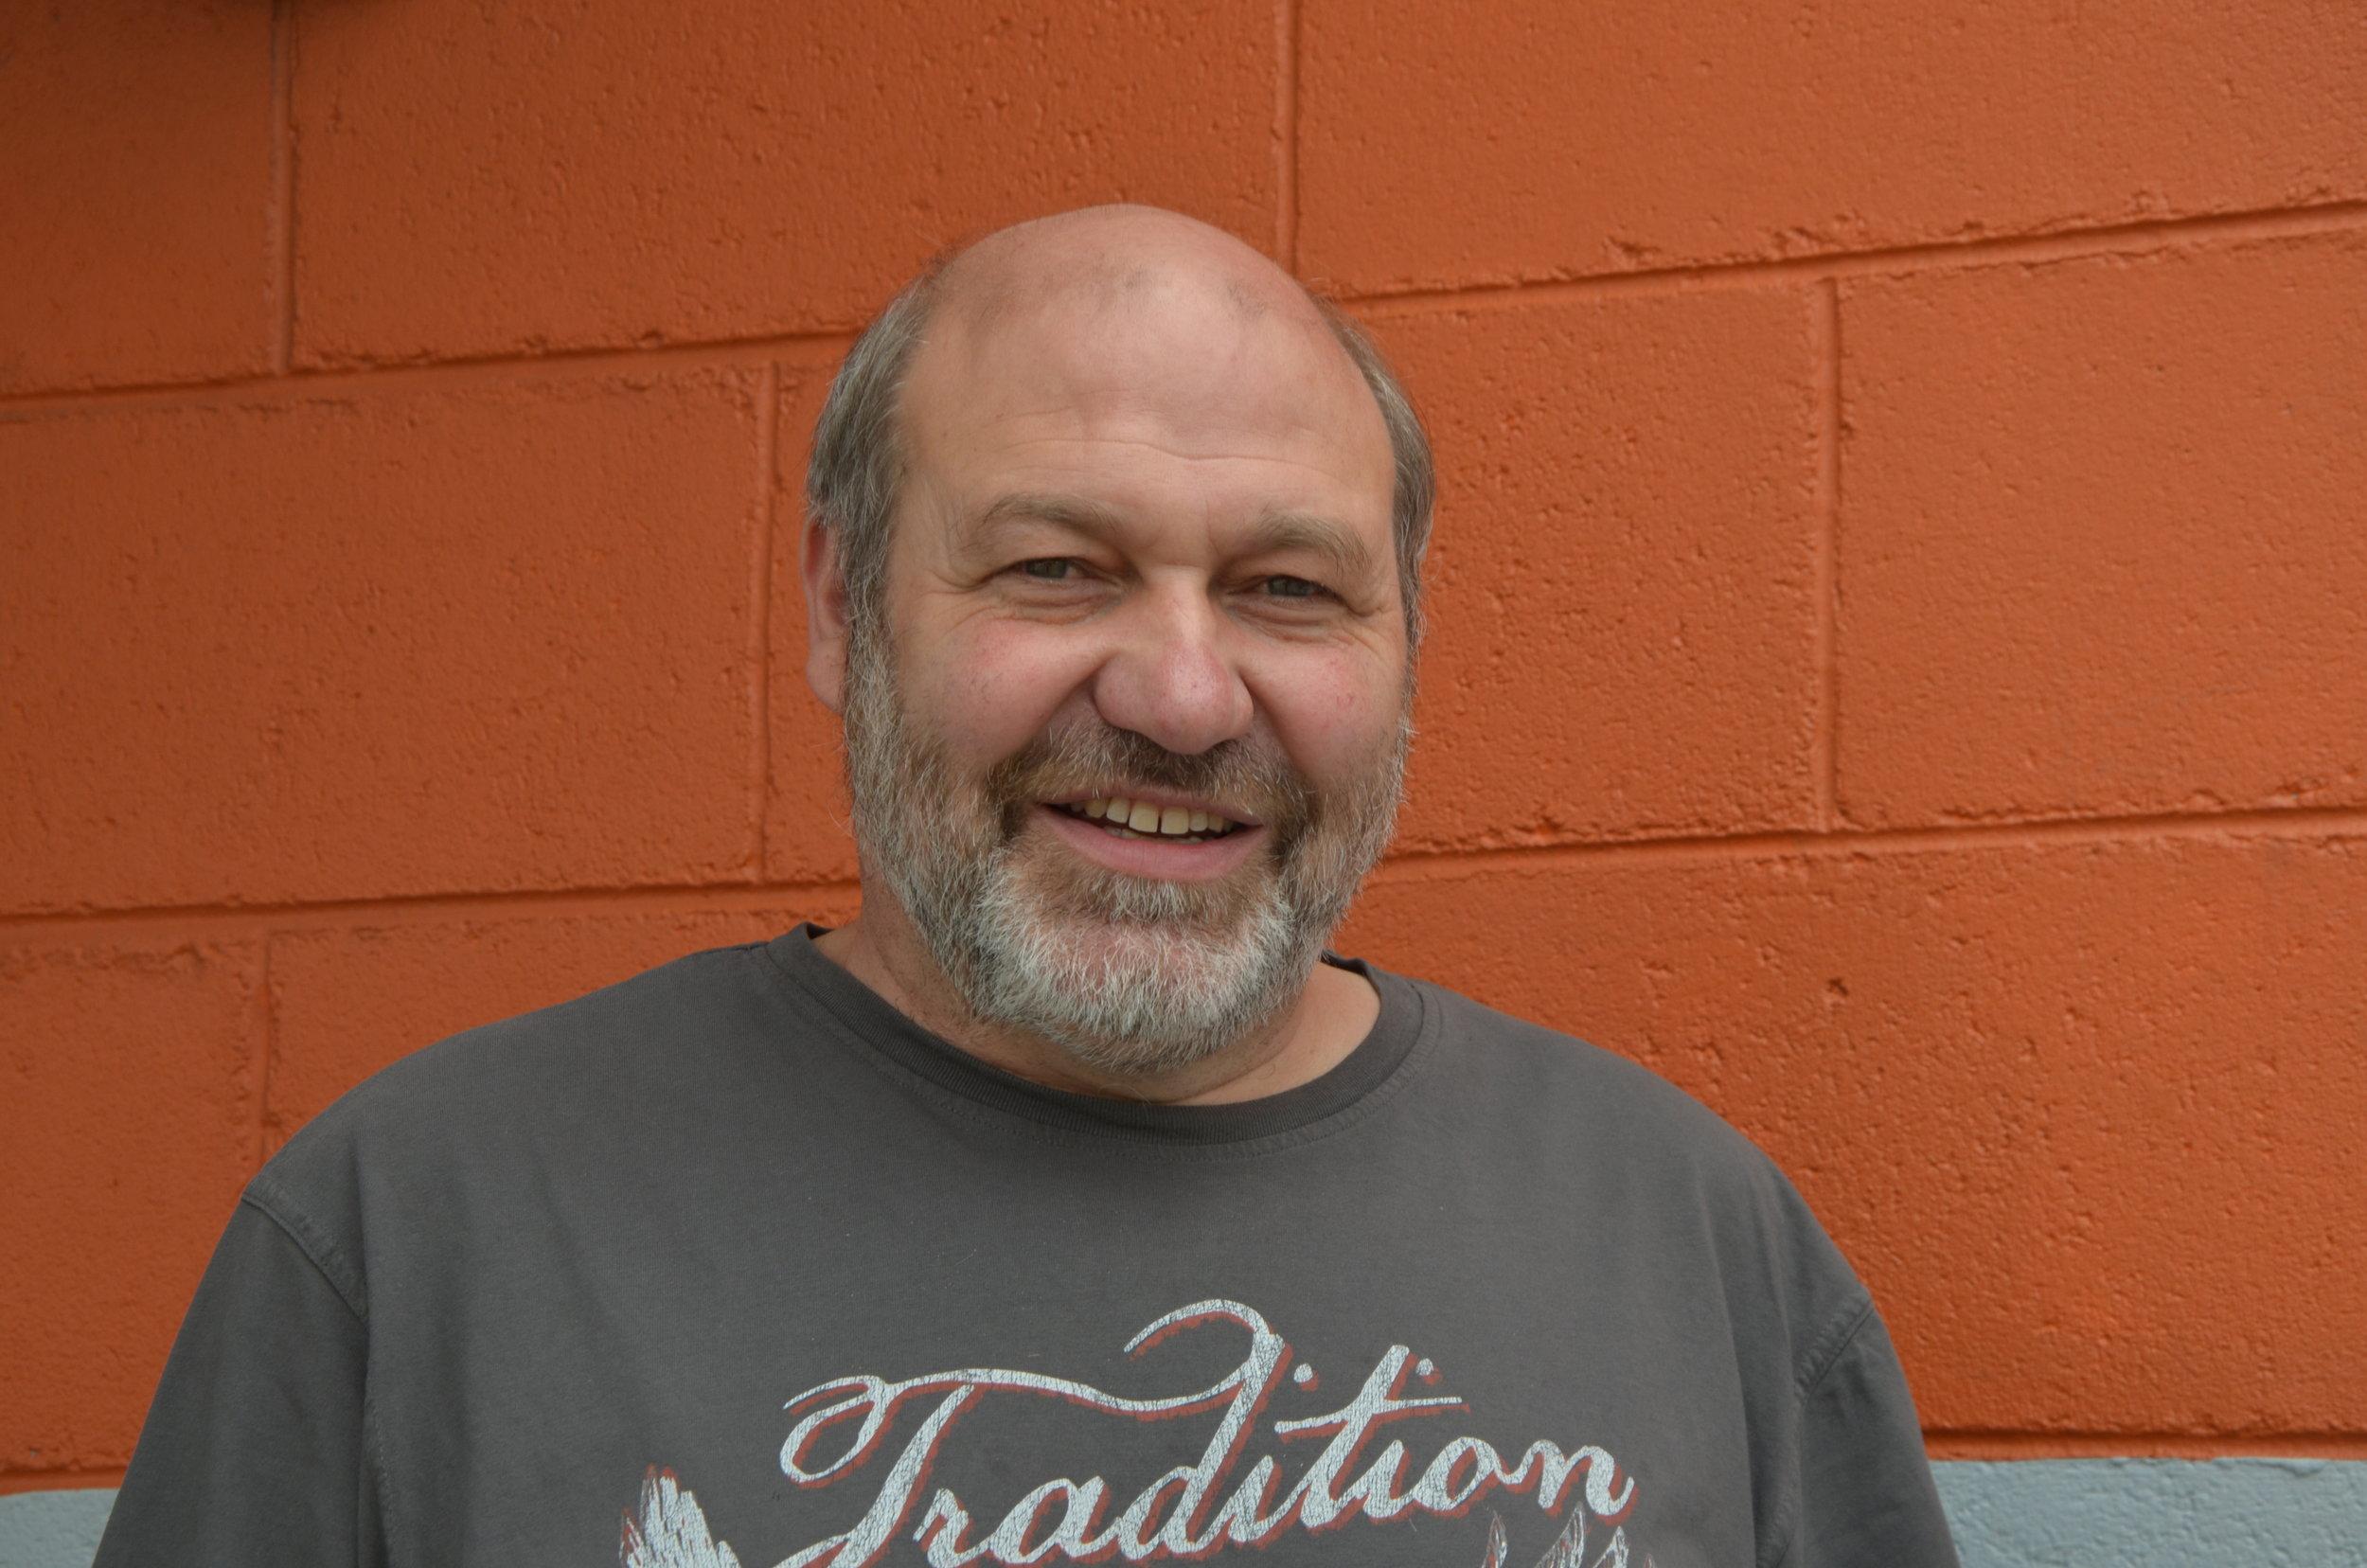 Stefan Wagner - leader of the Men's Missional Community